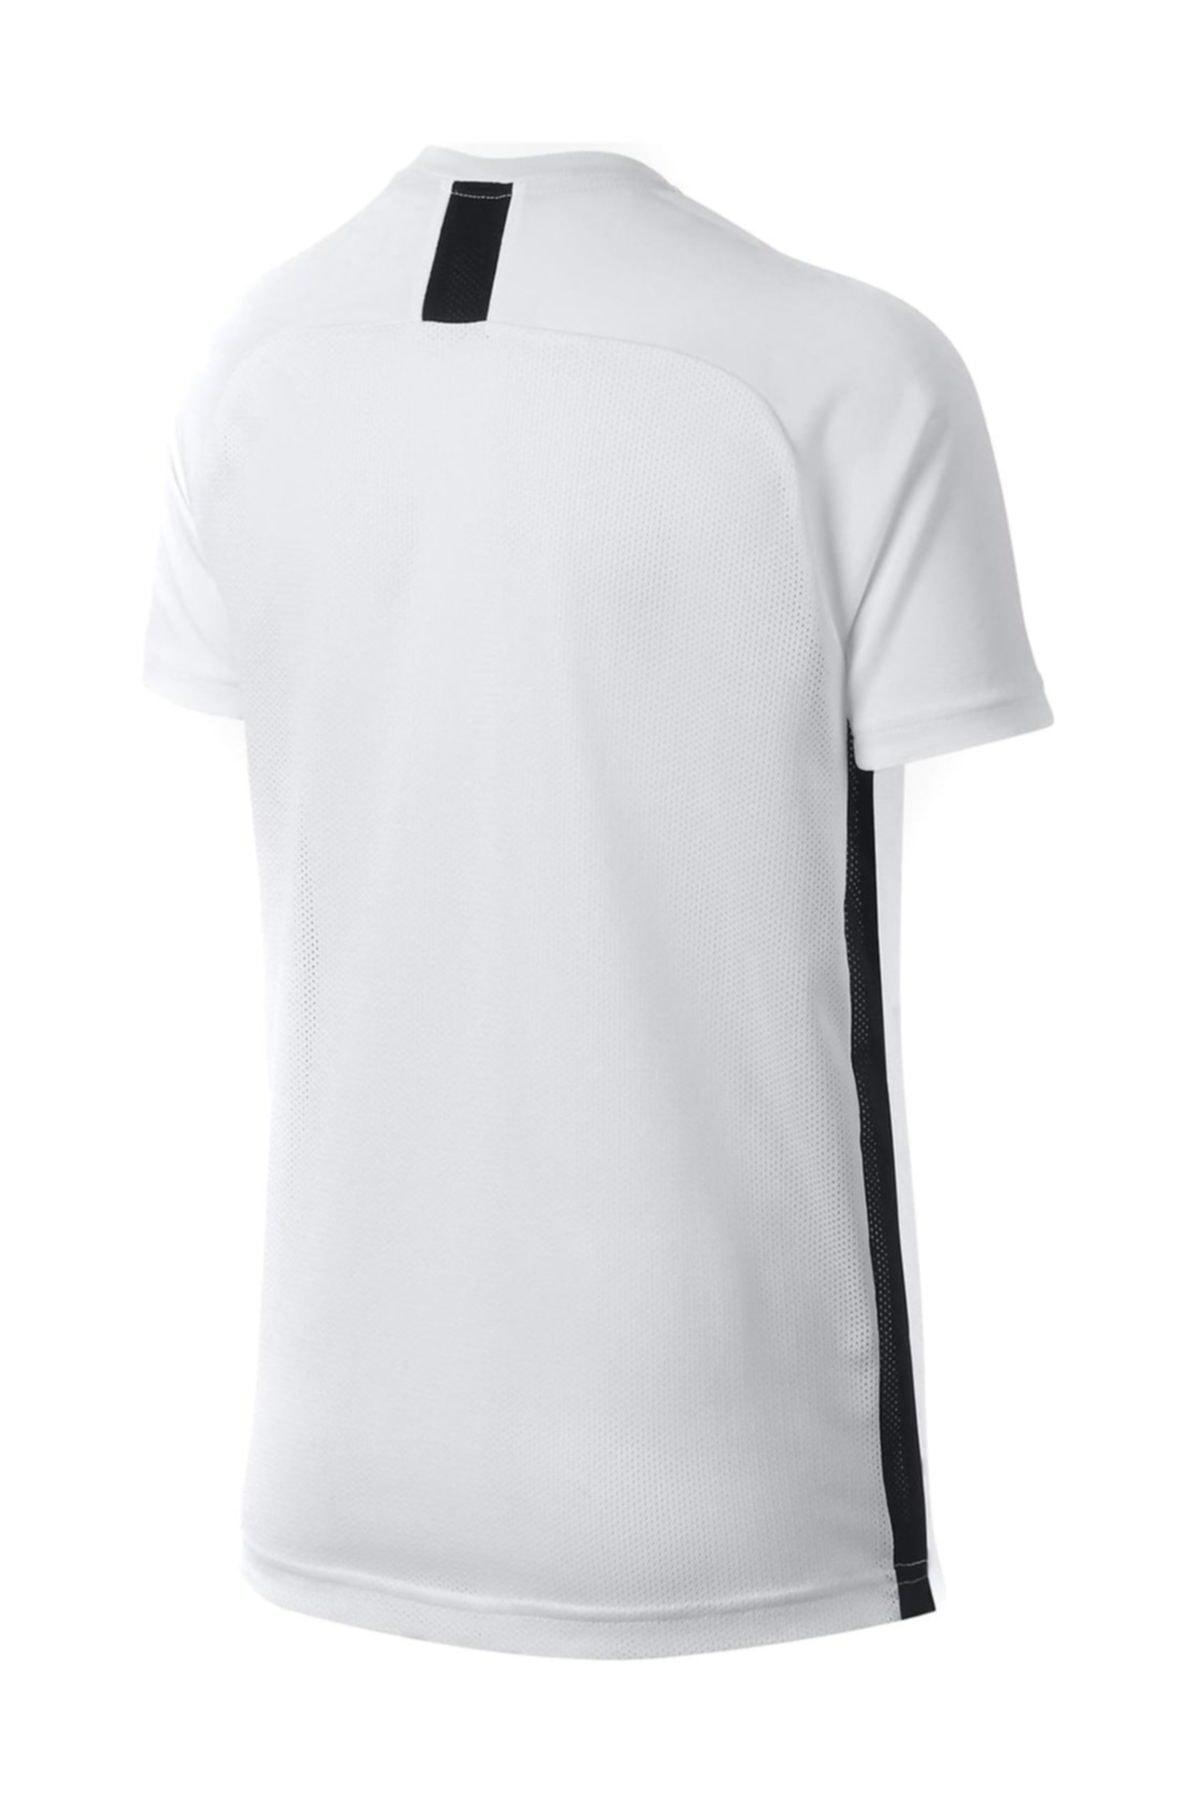 Nike Kids Beyaz Unisex Çocuk T-Shirt B Nk Dry Acdmy Top Ss 2